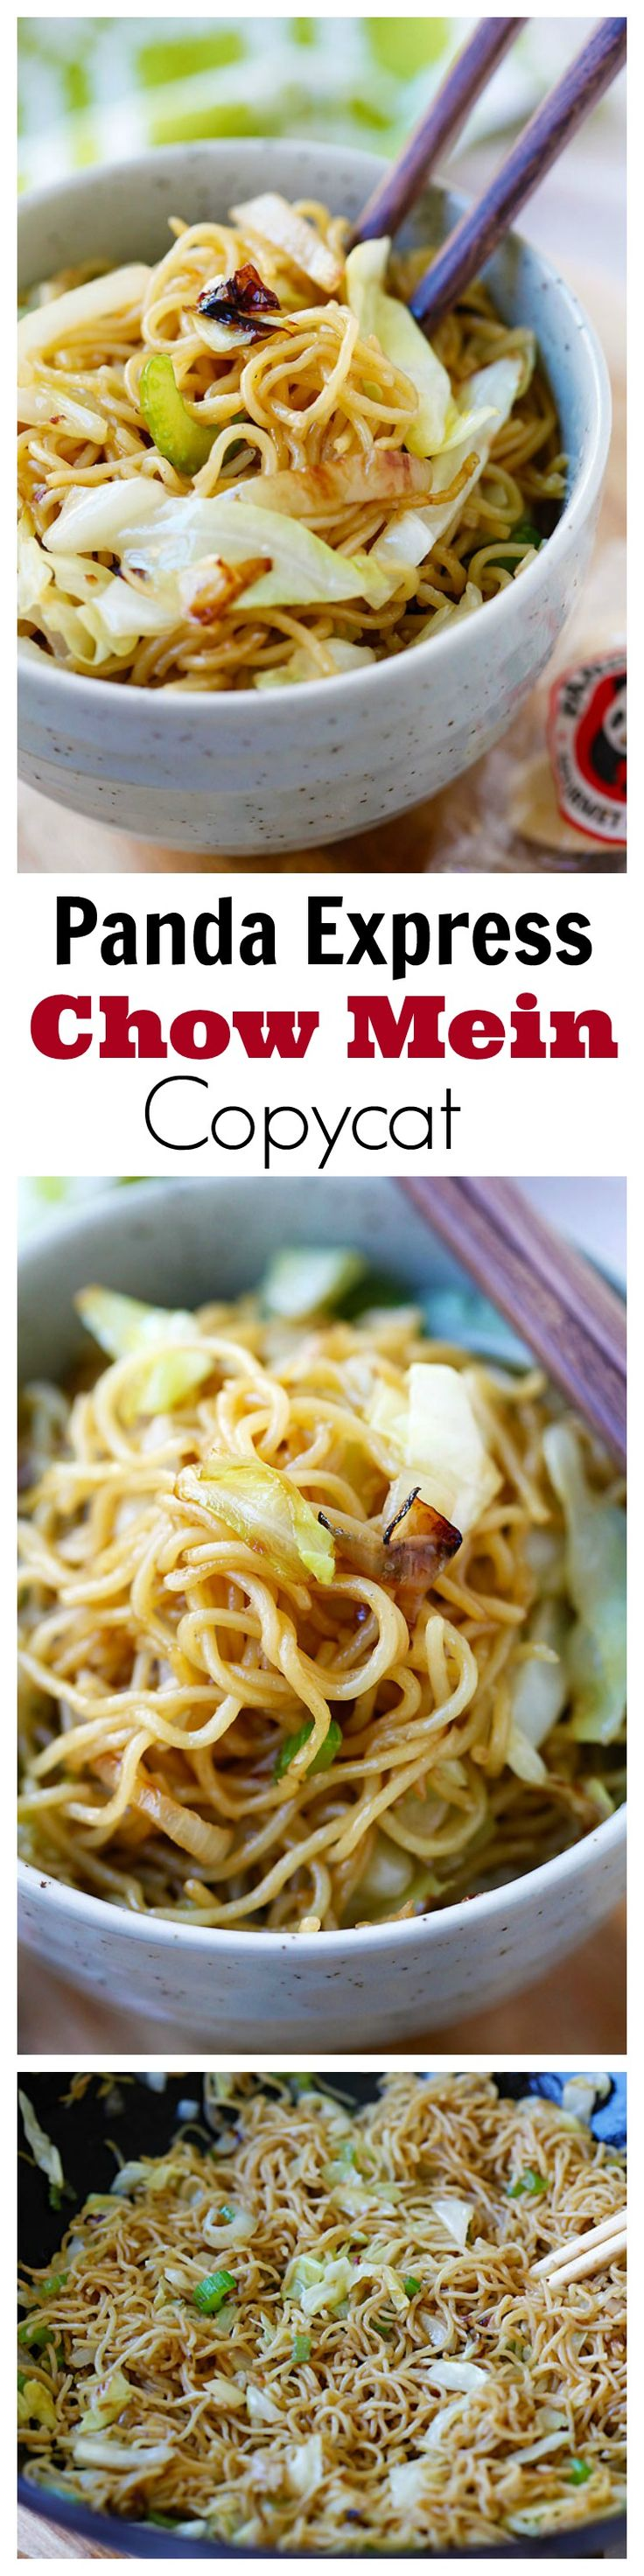 Panda Express Chow Mein!!  BEST copycat recipe EVER, tastes EXACTLY like Panda Express. So good, so easy, takes 15 mins!!!   rasamalaysia.com